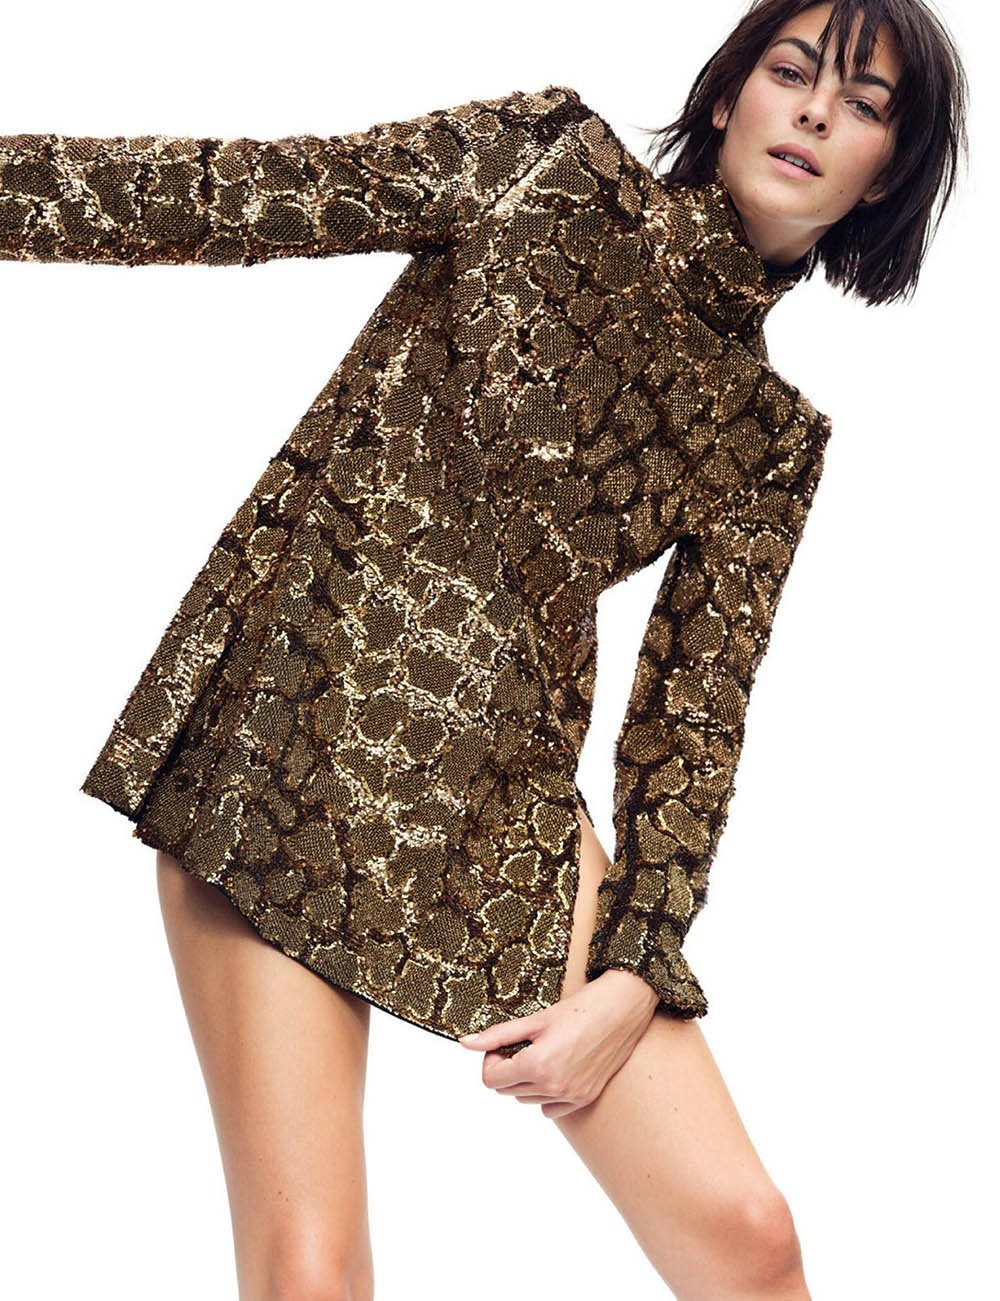 Vittoria Ceretti by Nathaniel Goldberg for Vogue Paris August 2020